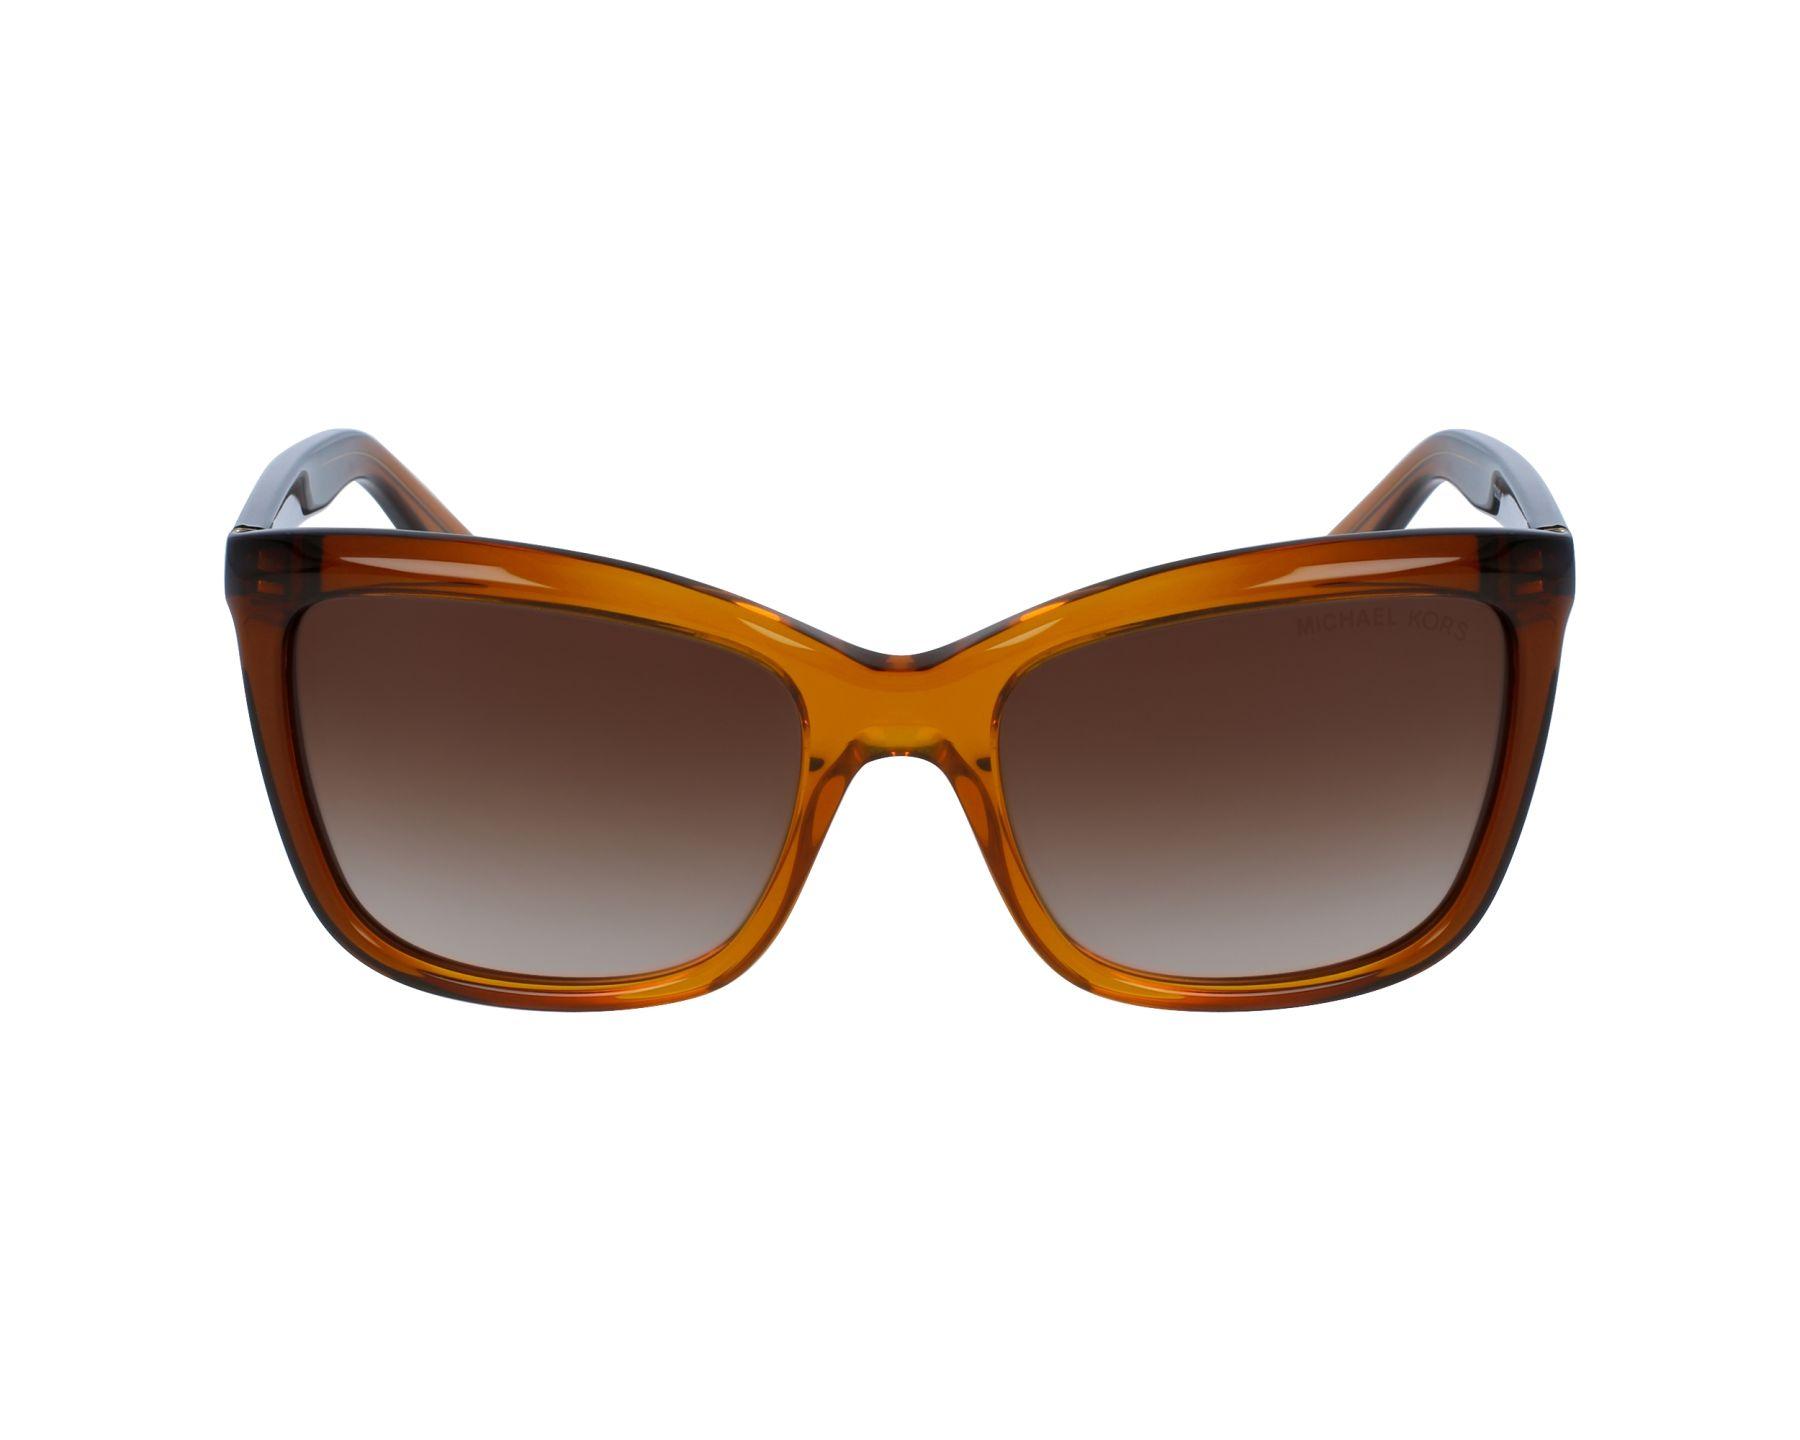 Buy Michael Kors Sunglasses MK-2039 321813 Online - Visionet